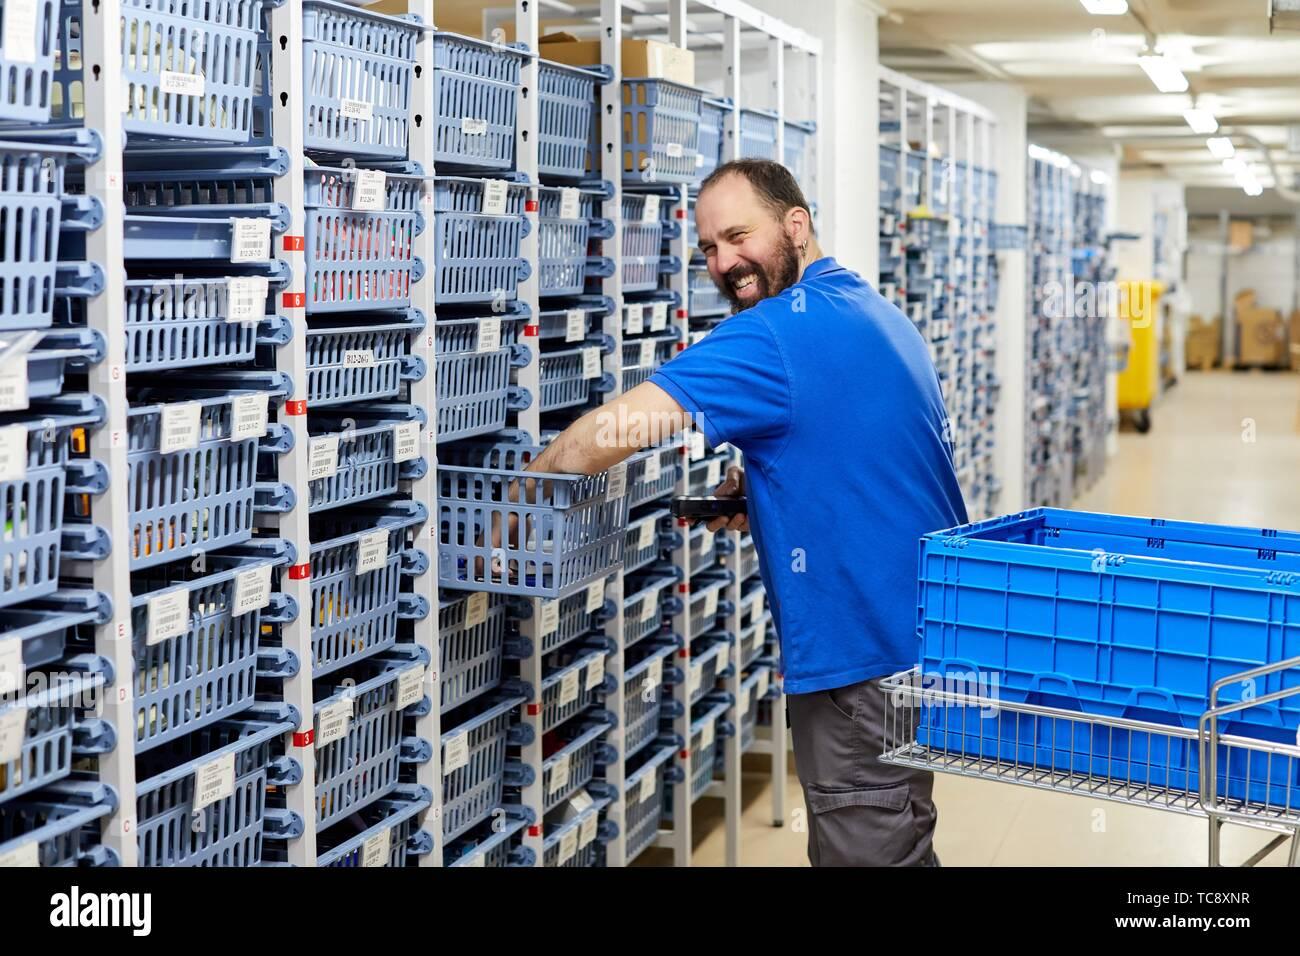 Codice a barre reader, magazzino, Storage, Ospedale Donostia, San Sebastian, Gipuzkoa, Paesi Baschi Immagini Stock